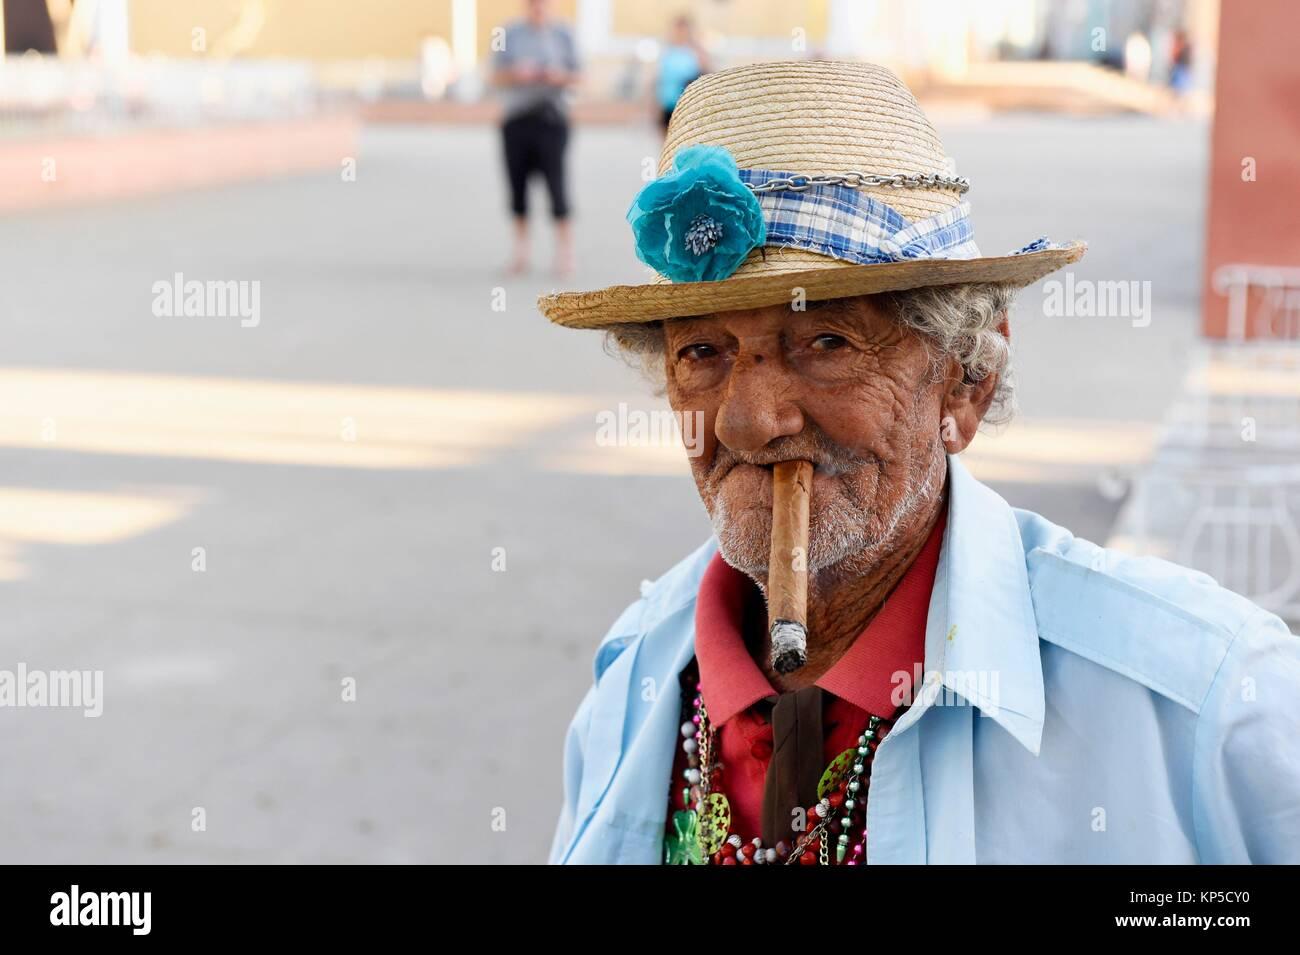 d6ef7ab7f Portrait of old man smoking cigar,Remedios, Cuba Stock Photo ...